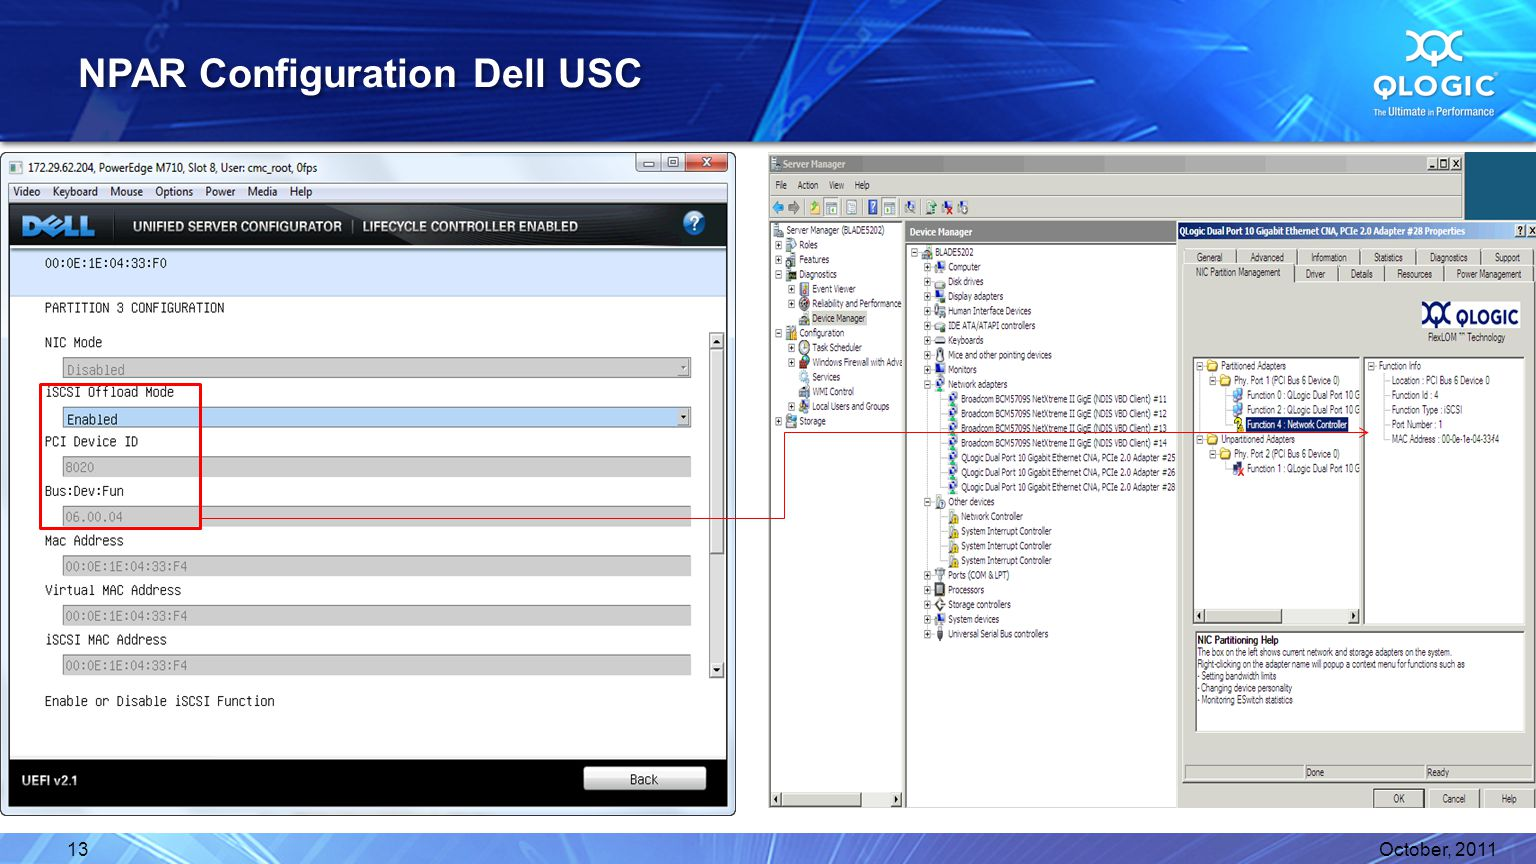 NPAR Configuration Dell USC